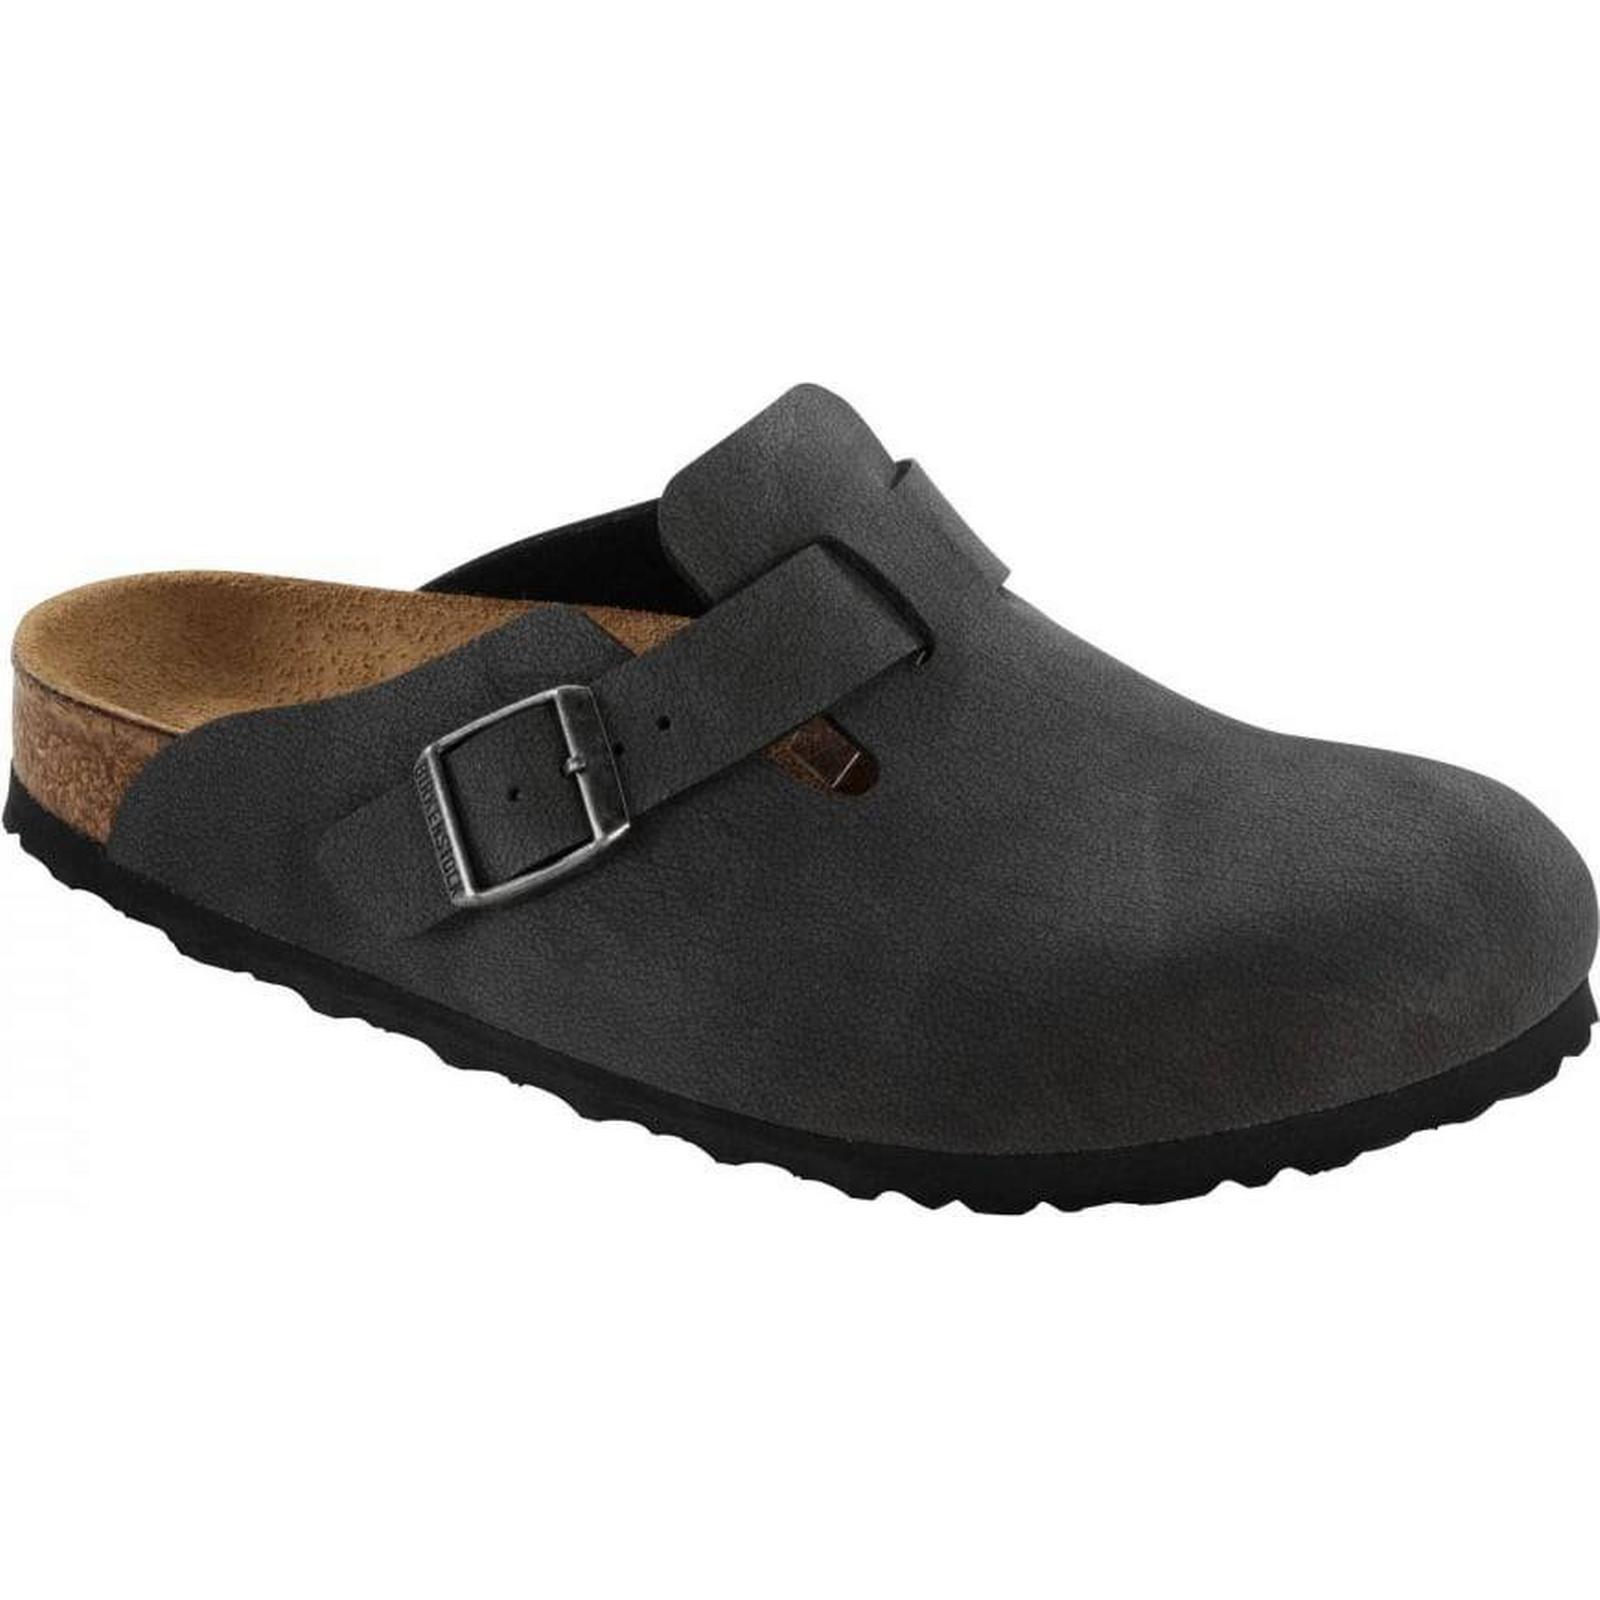 Birkenstock Unisex Boston Narrow Fit 44 - Black 0060193 Size: 44 Fit EU b30a8c